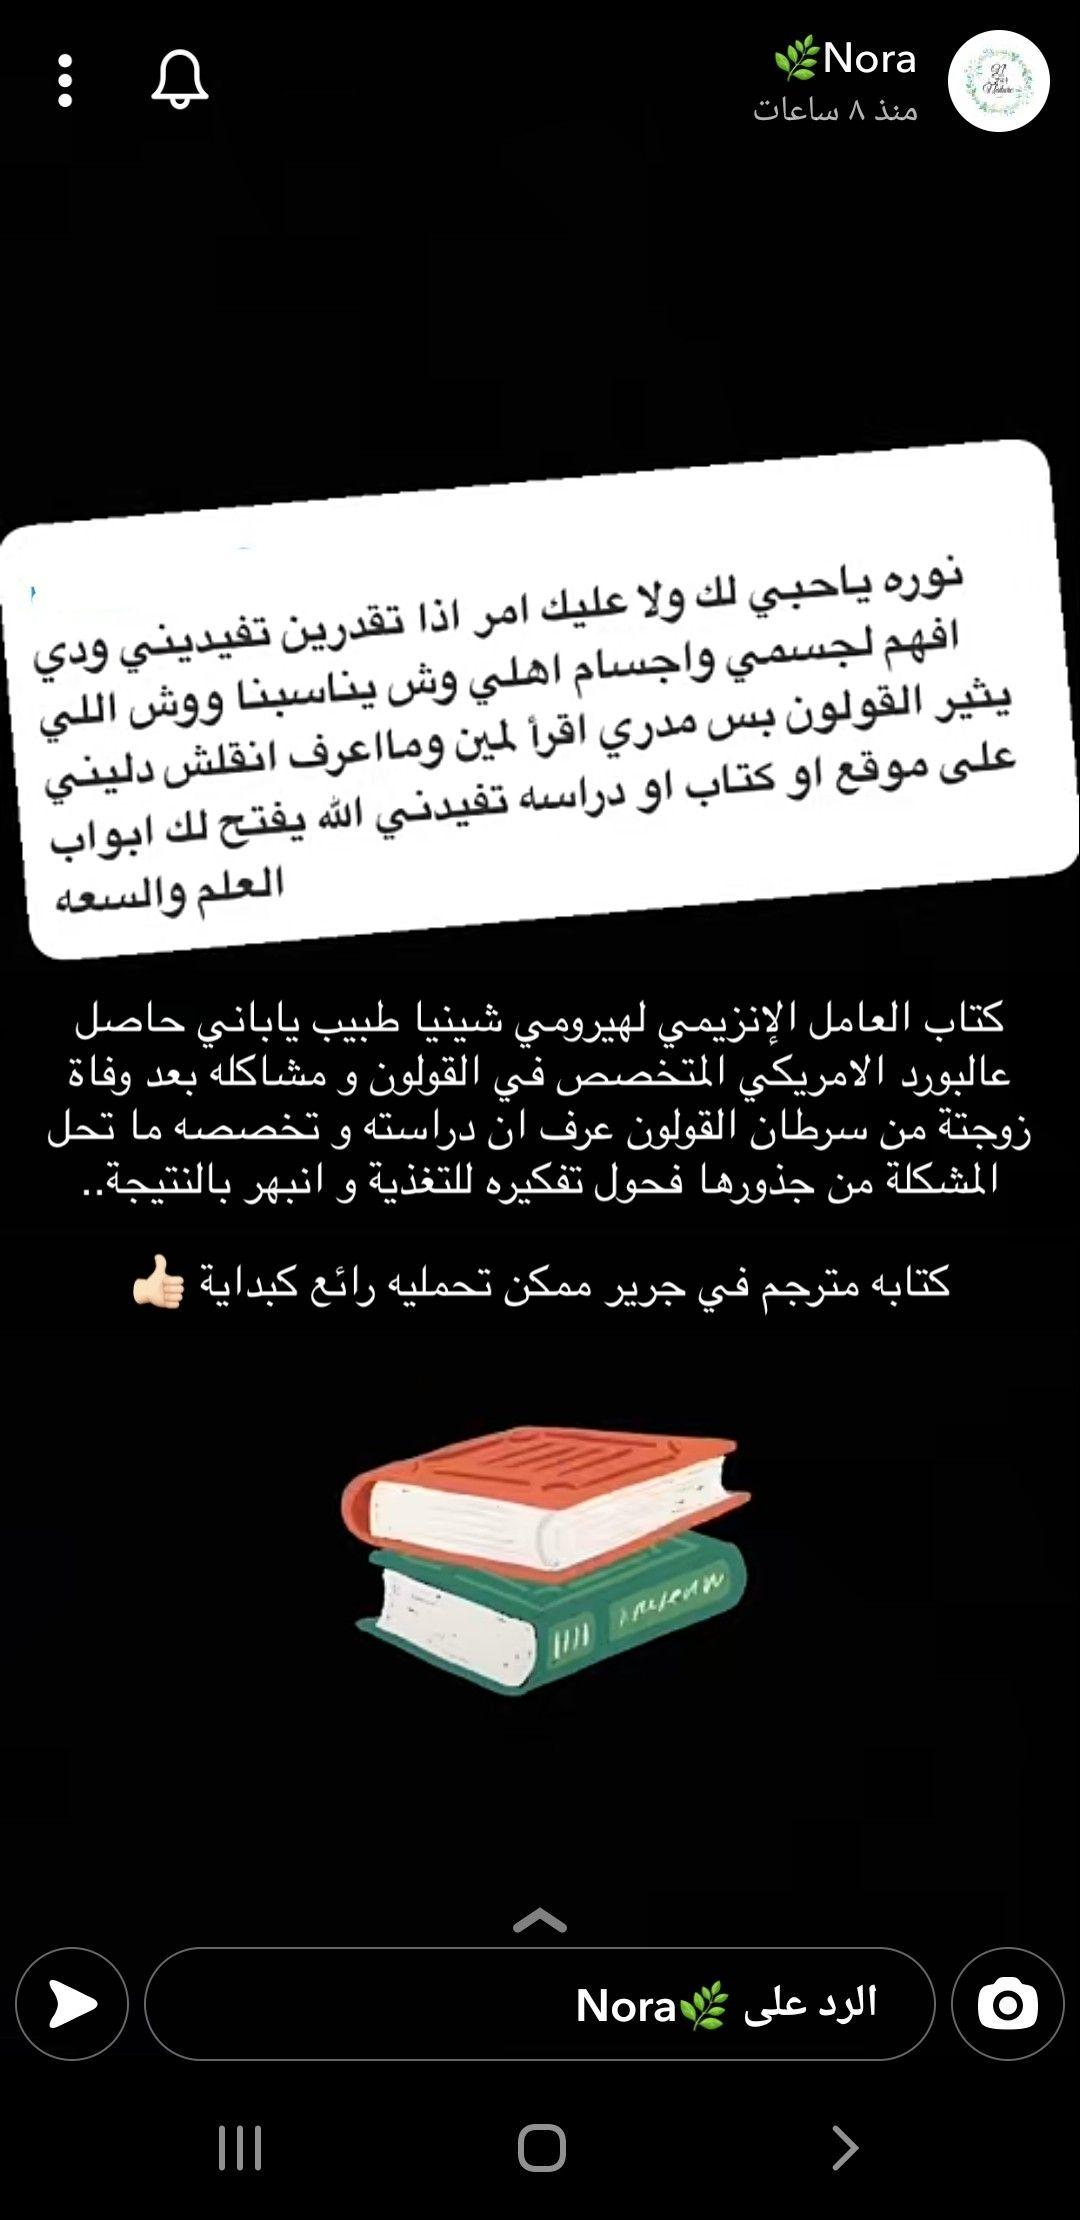 Pin By Aman On تغذية علاجية المعدة بيت الداء و الدواء توعية In 2021 Book Challenge Books Phrase